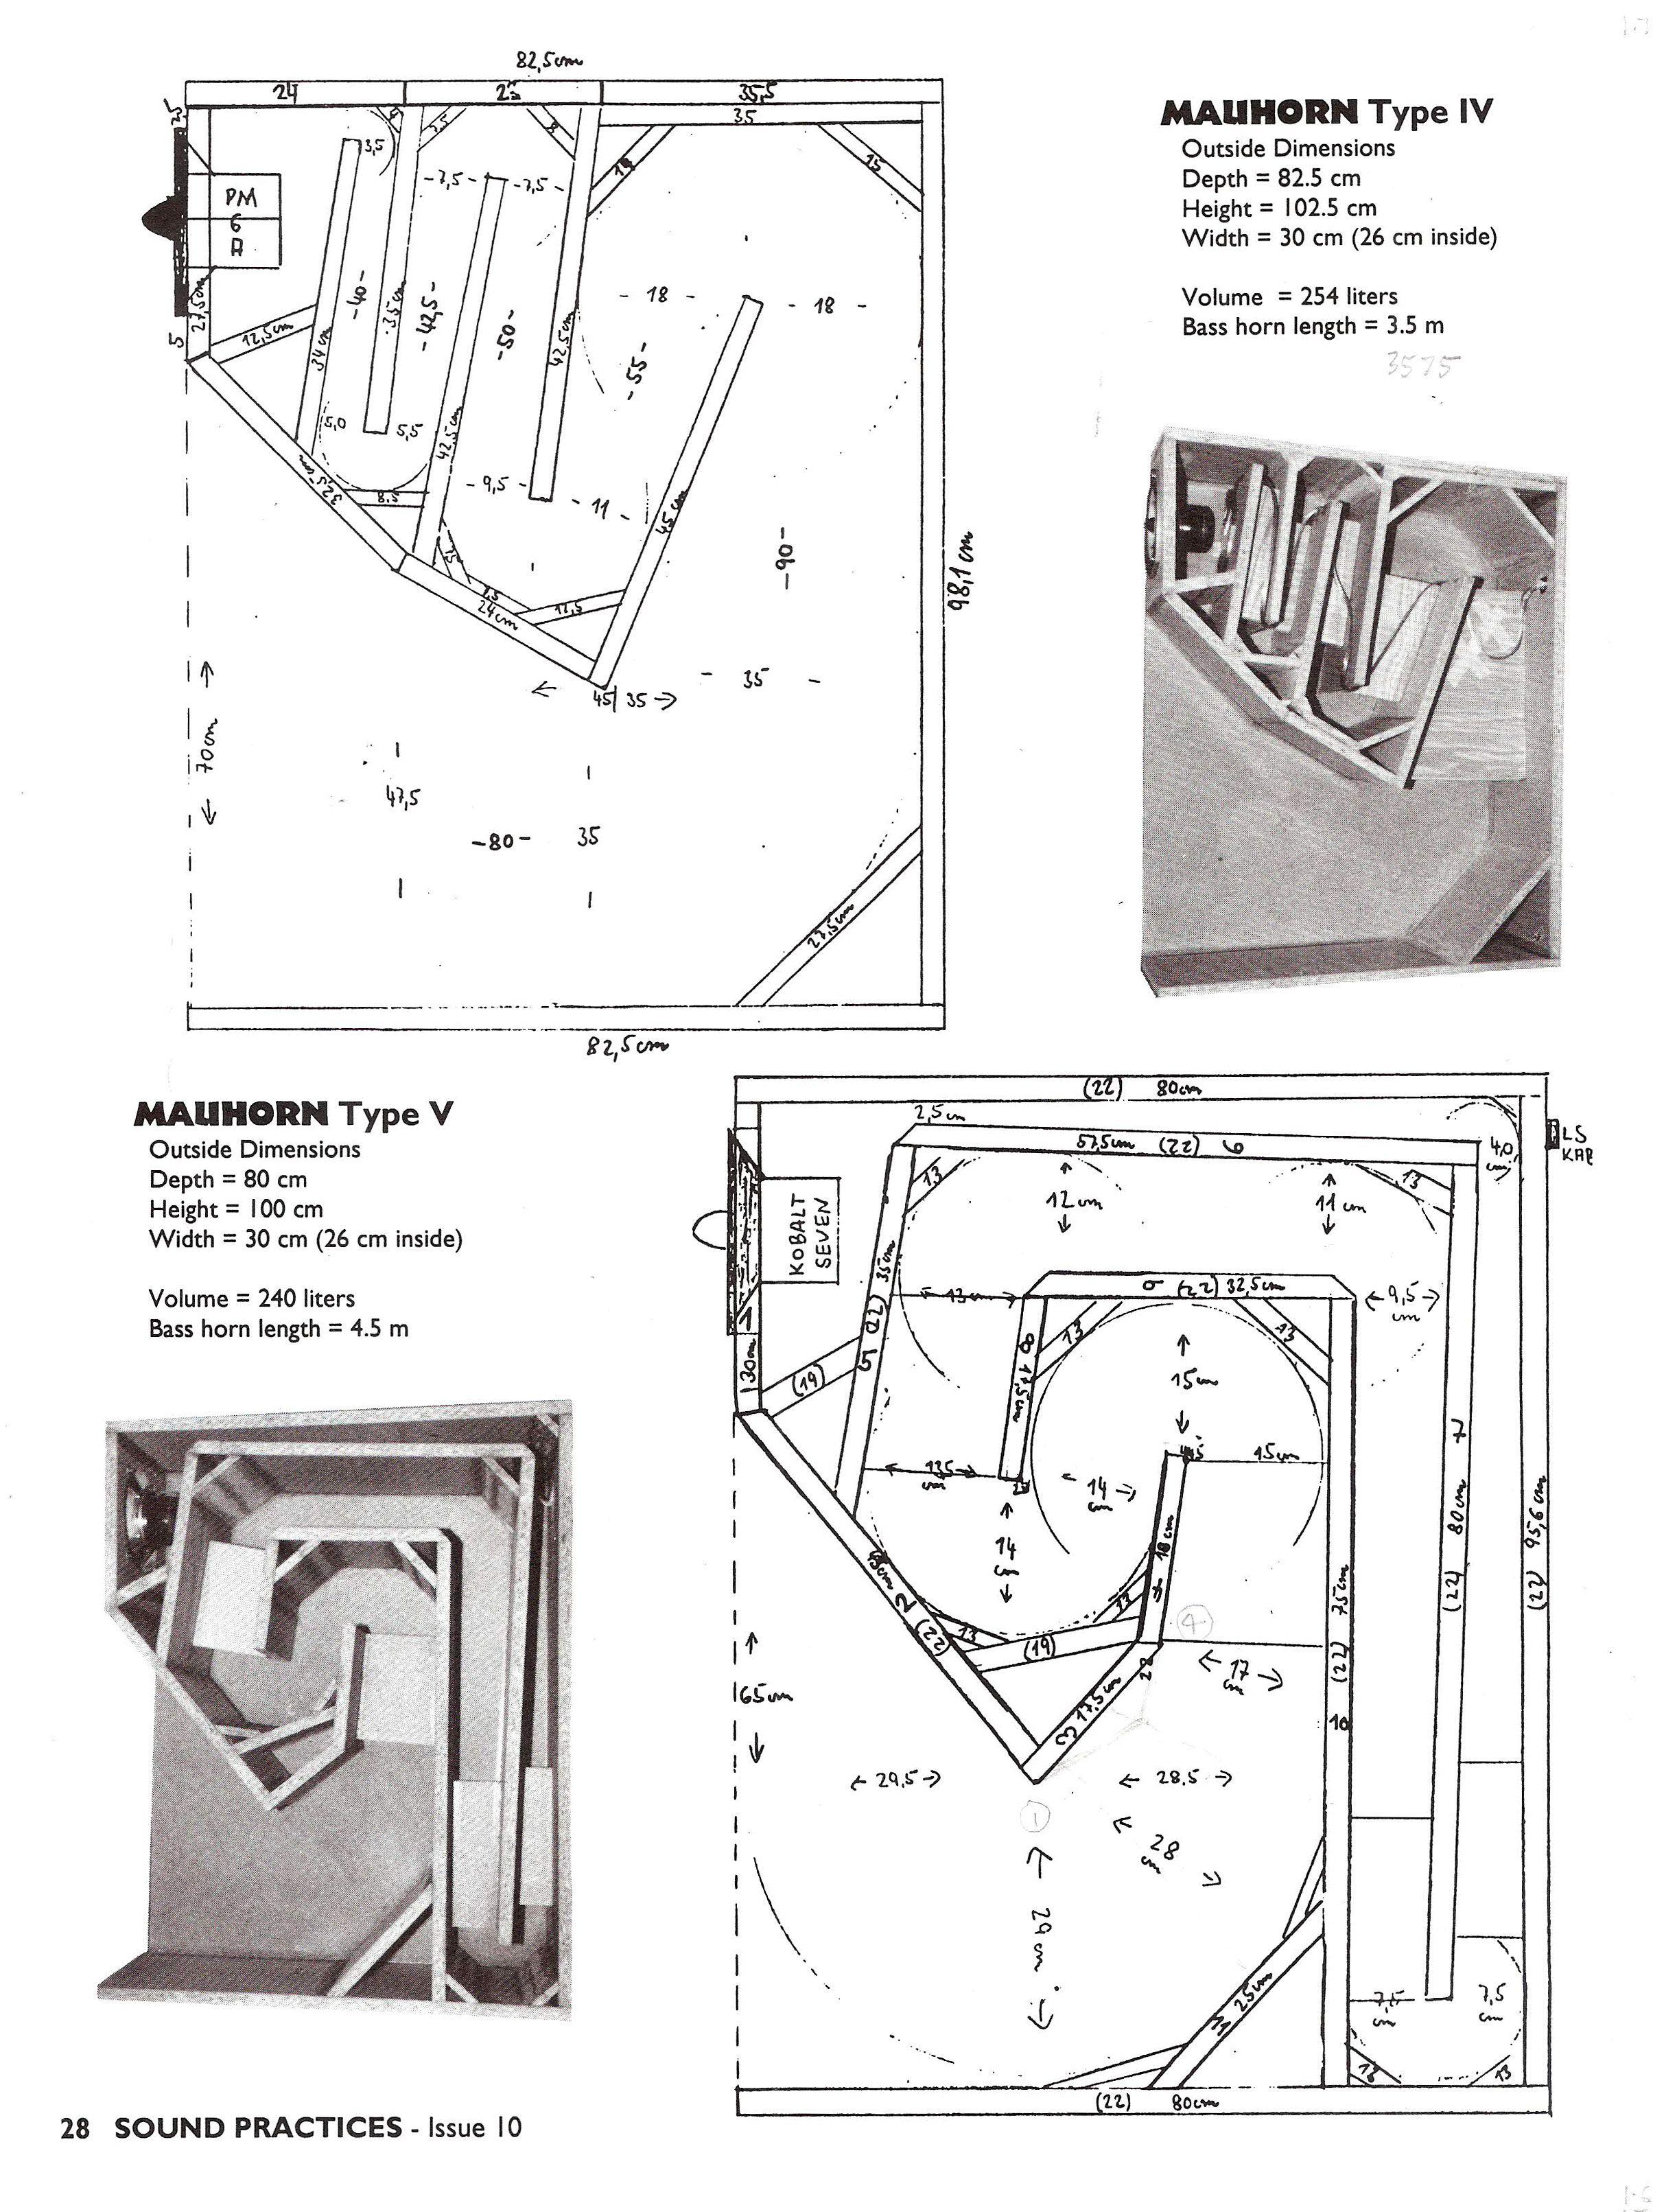 Skema box speaker woofer search results woodworking project ideas - Afbeeldingsresultaat Voor Single Driver Horn Speaker Plans